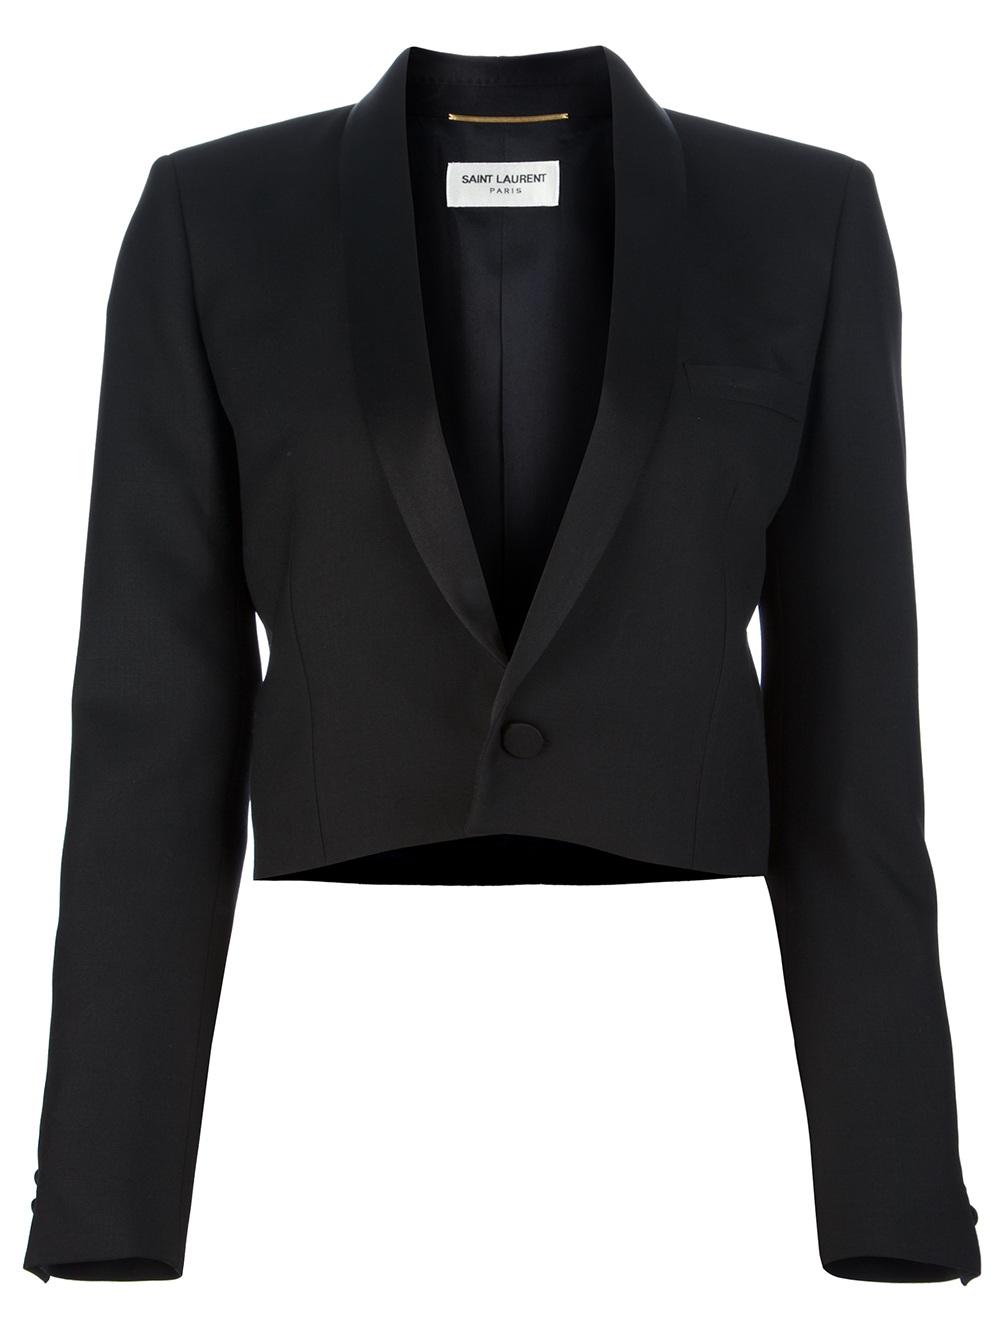 Saint laurent Cropped Jacket in Black | Lyst